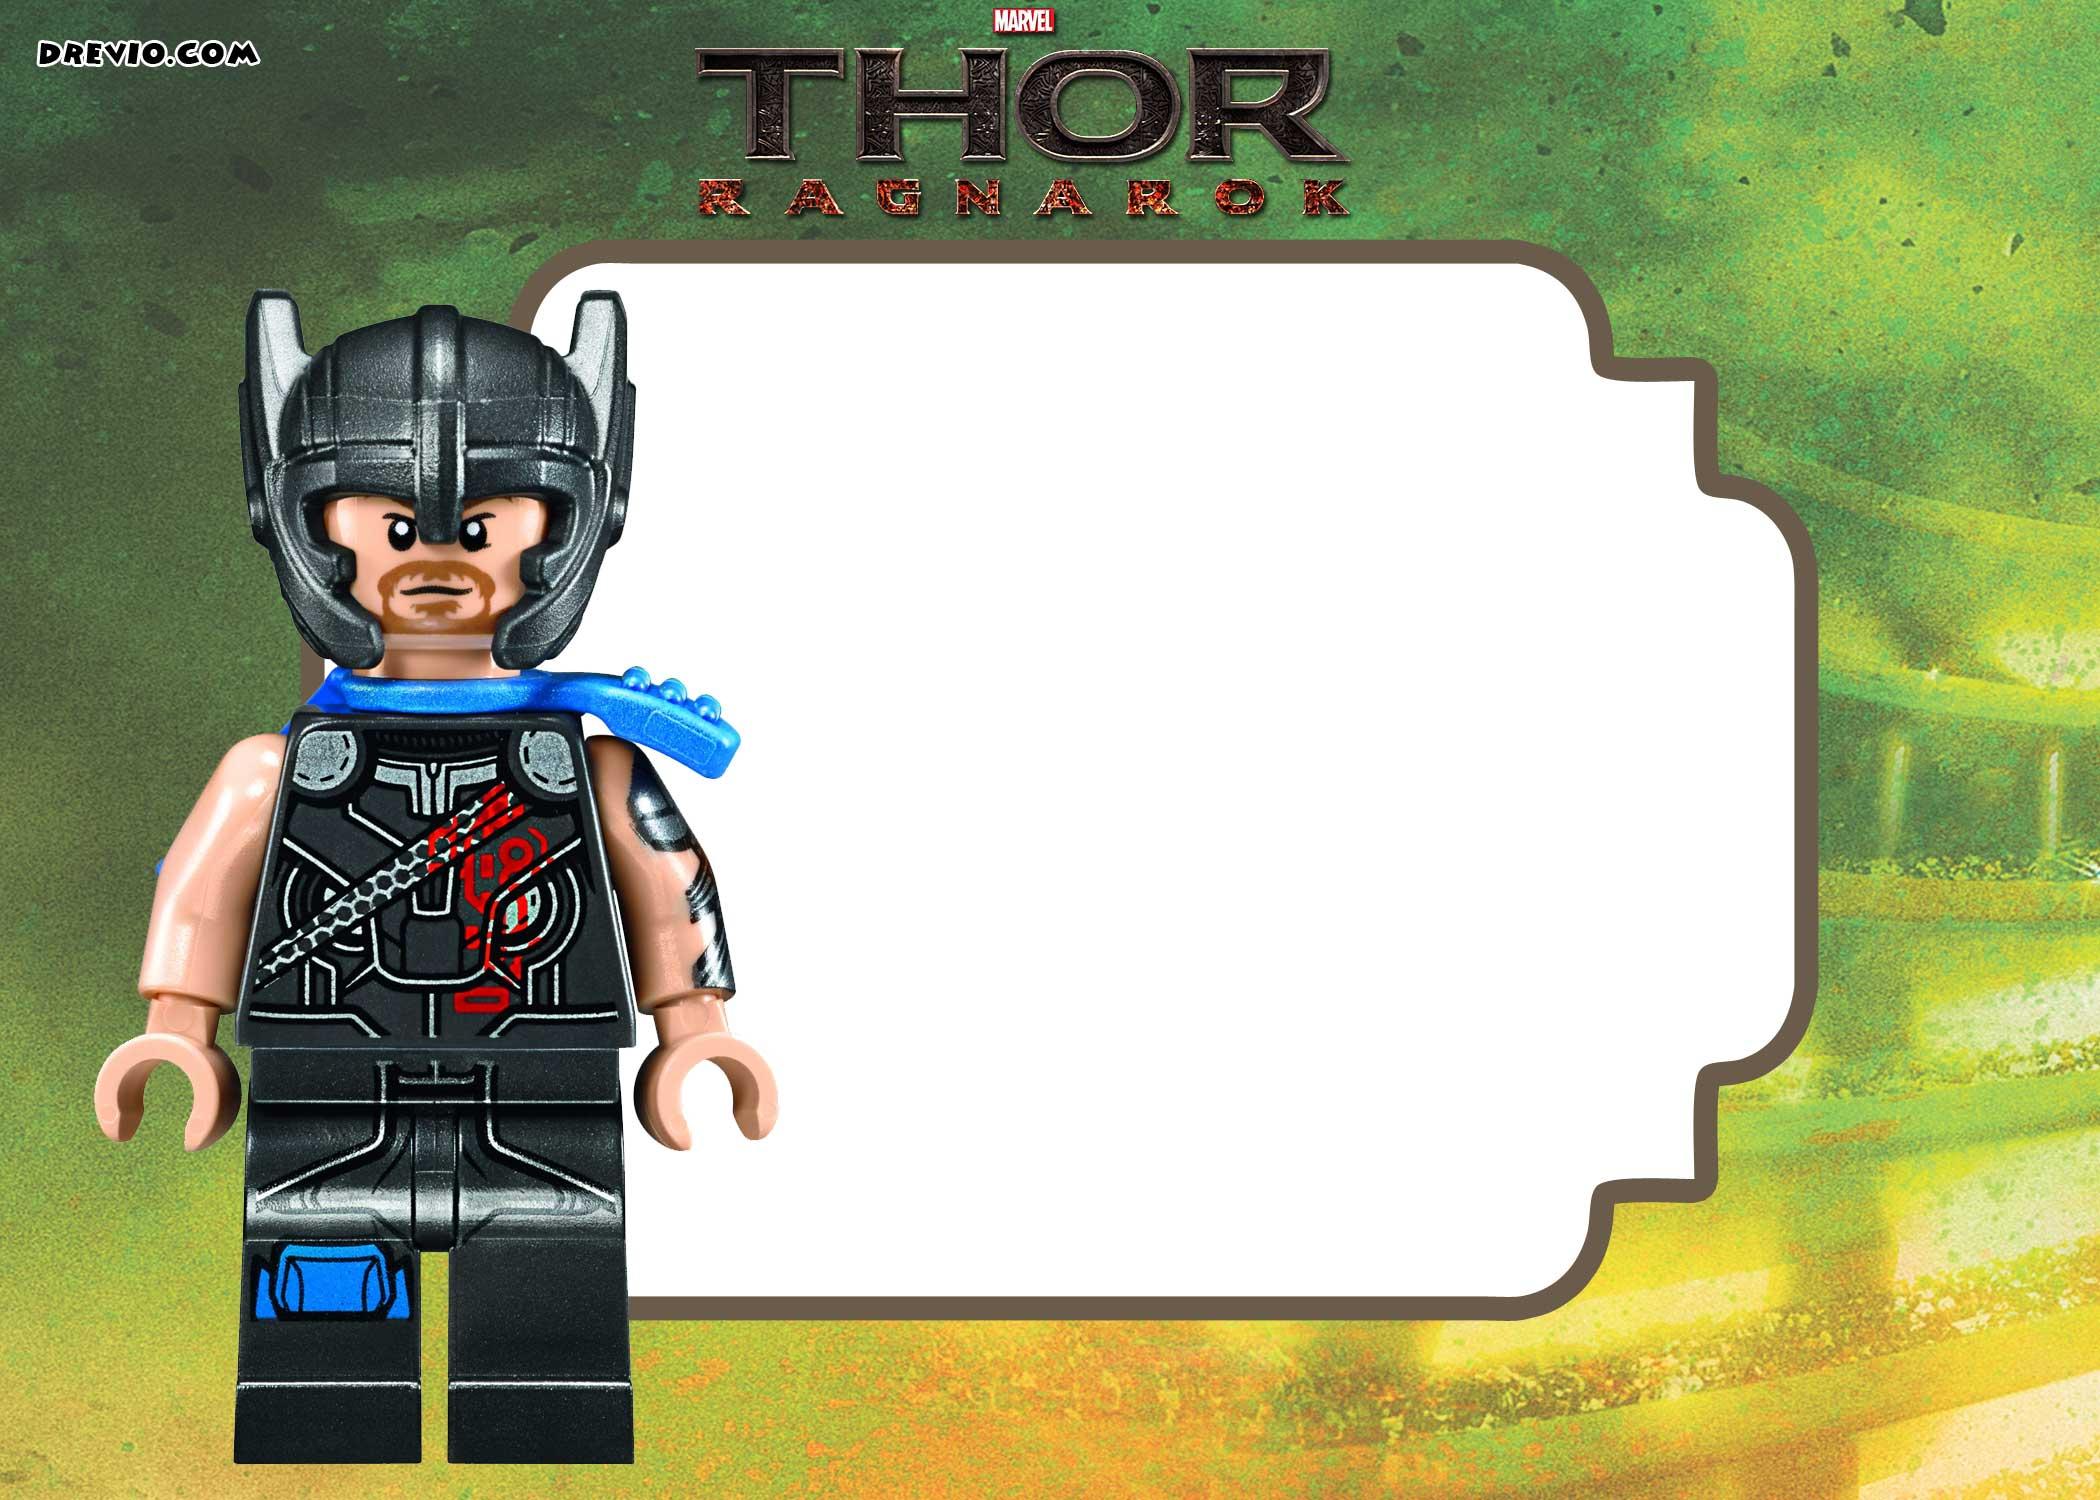 Thor Birthday Invitations - Ivoiregion